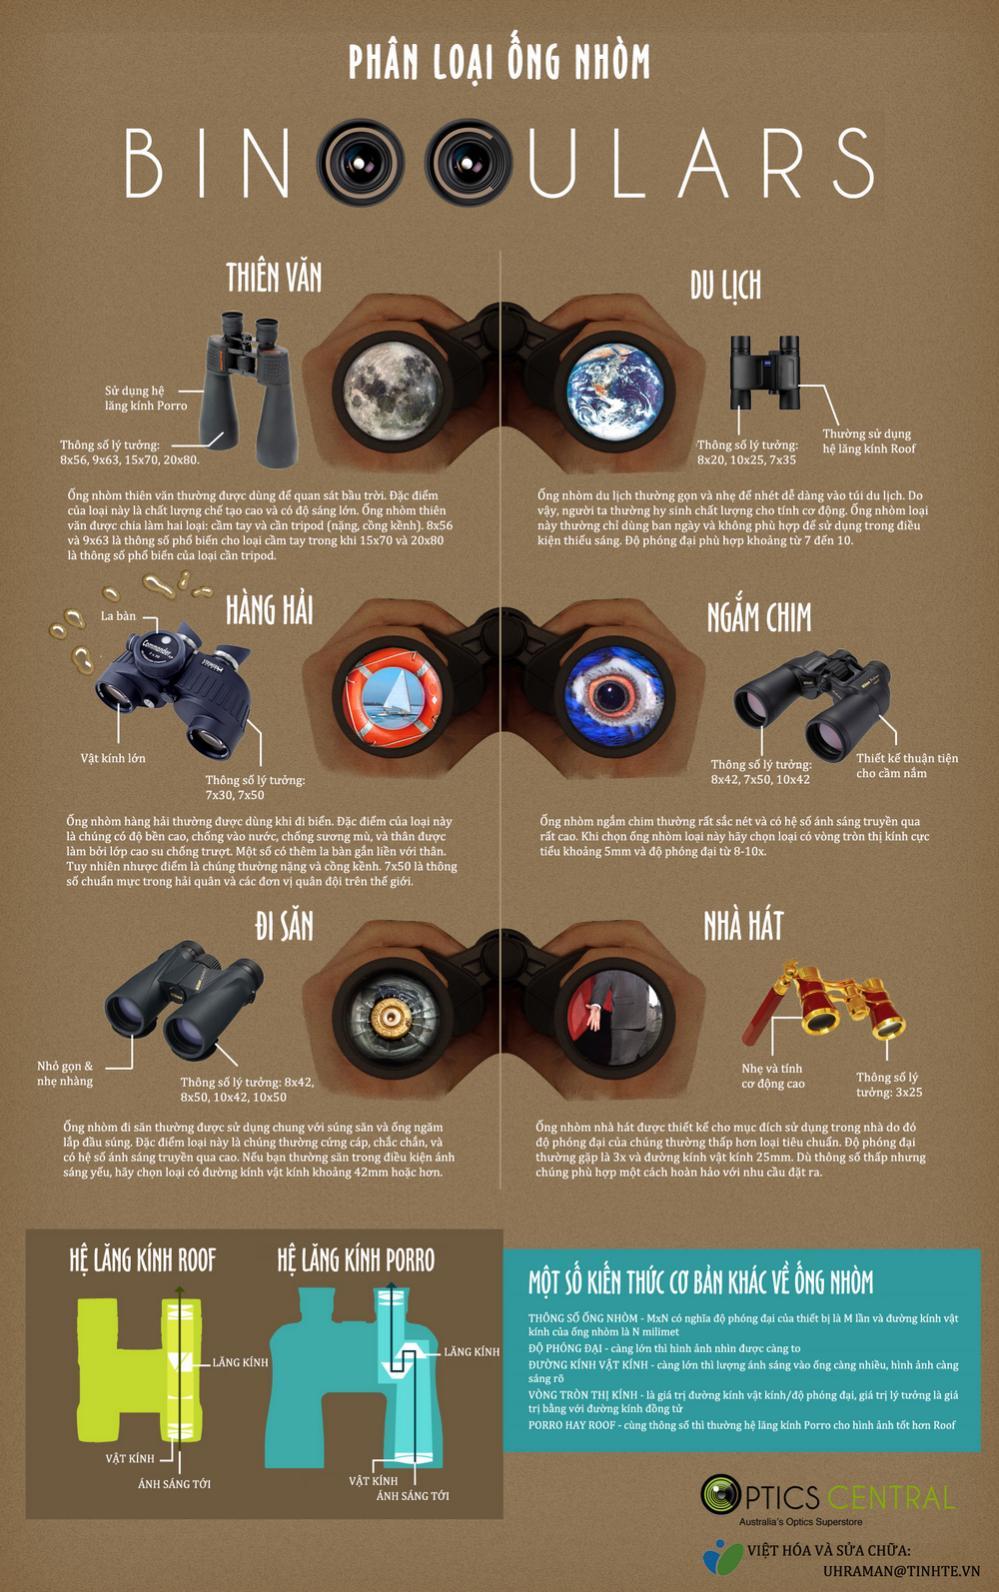 binoculars2.